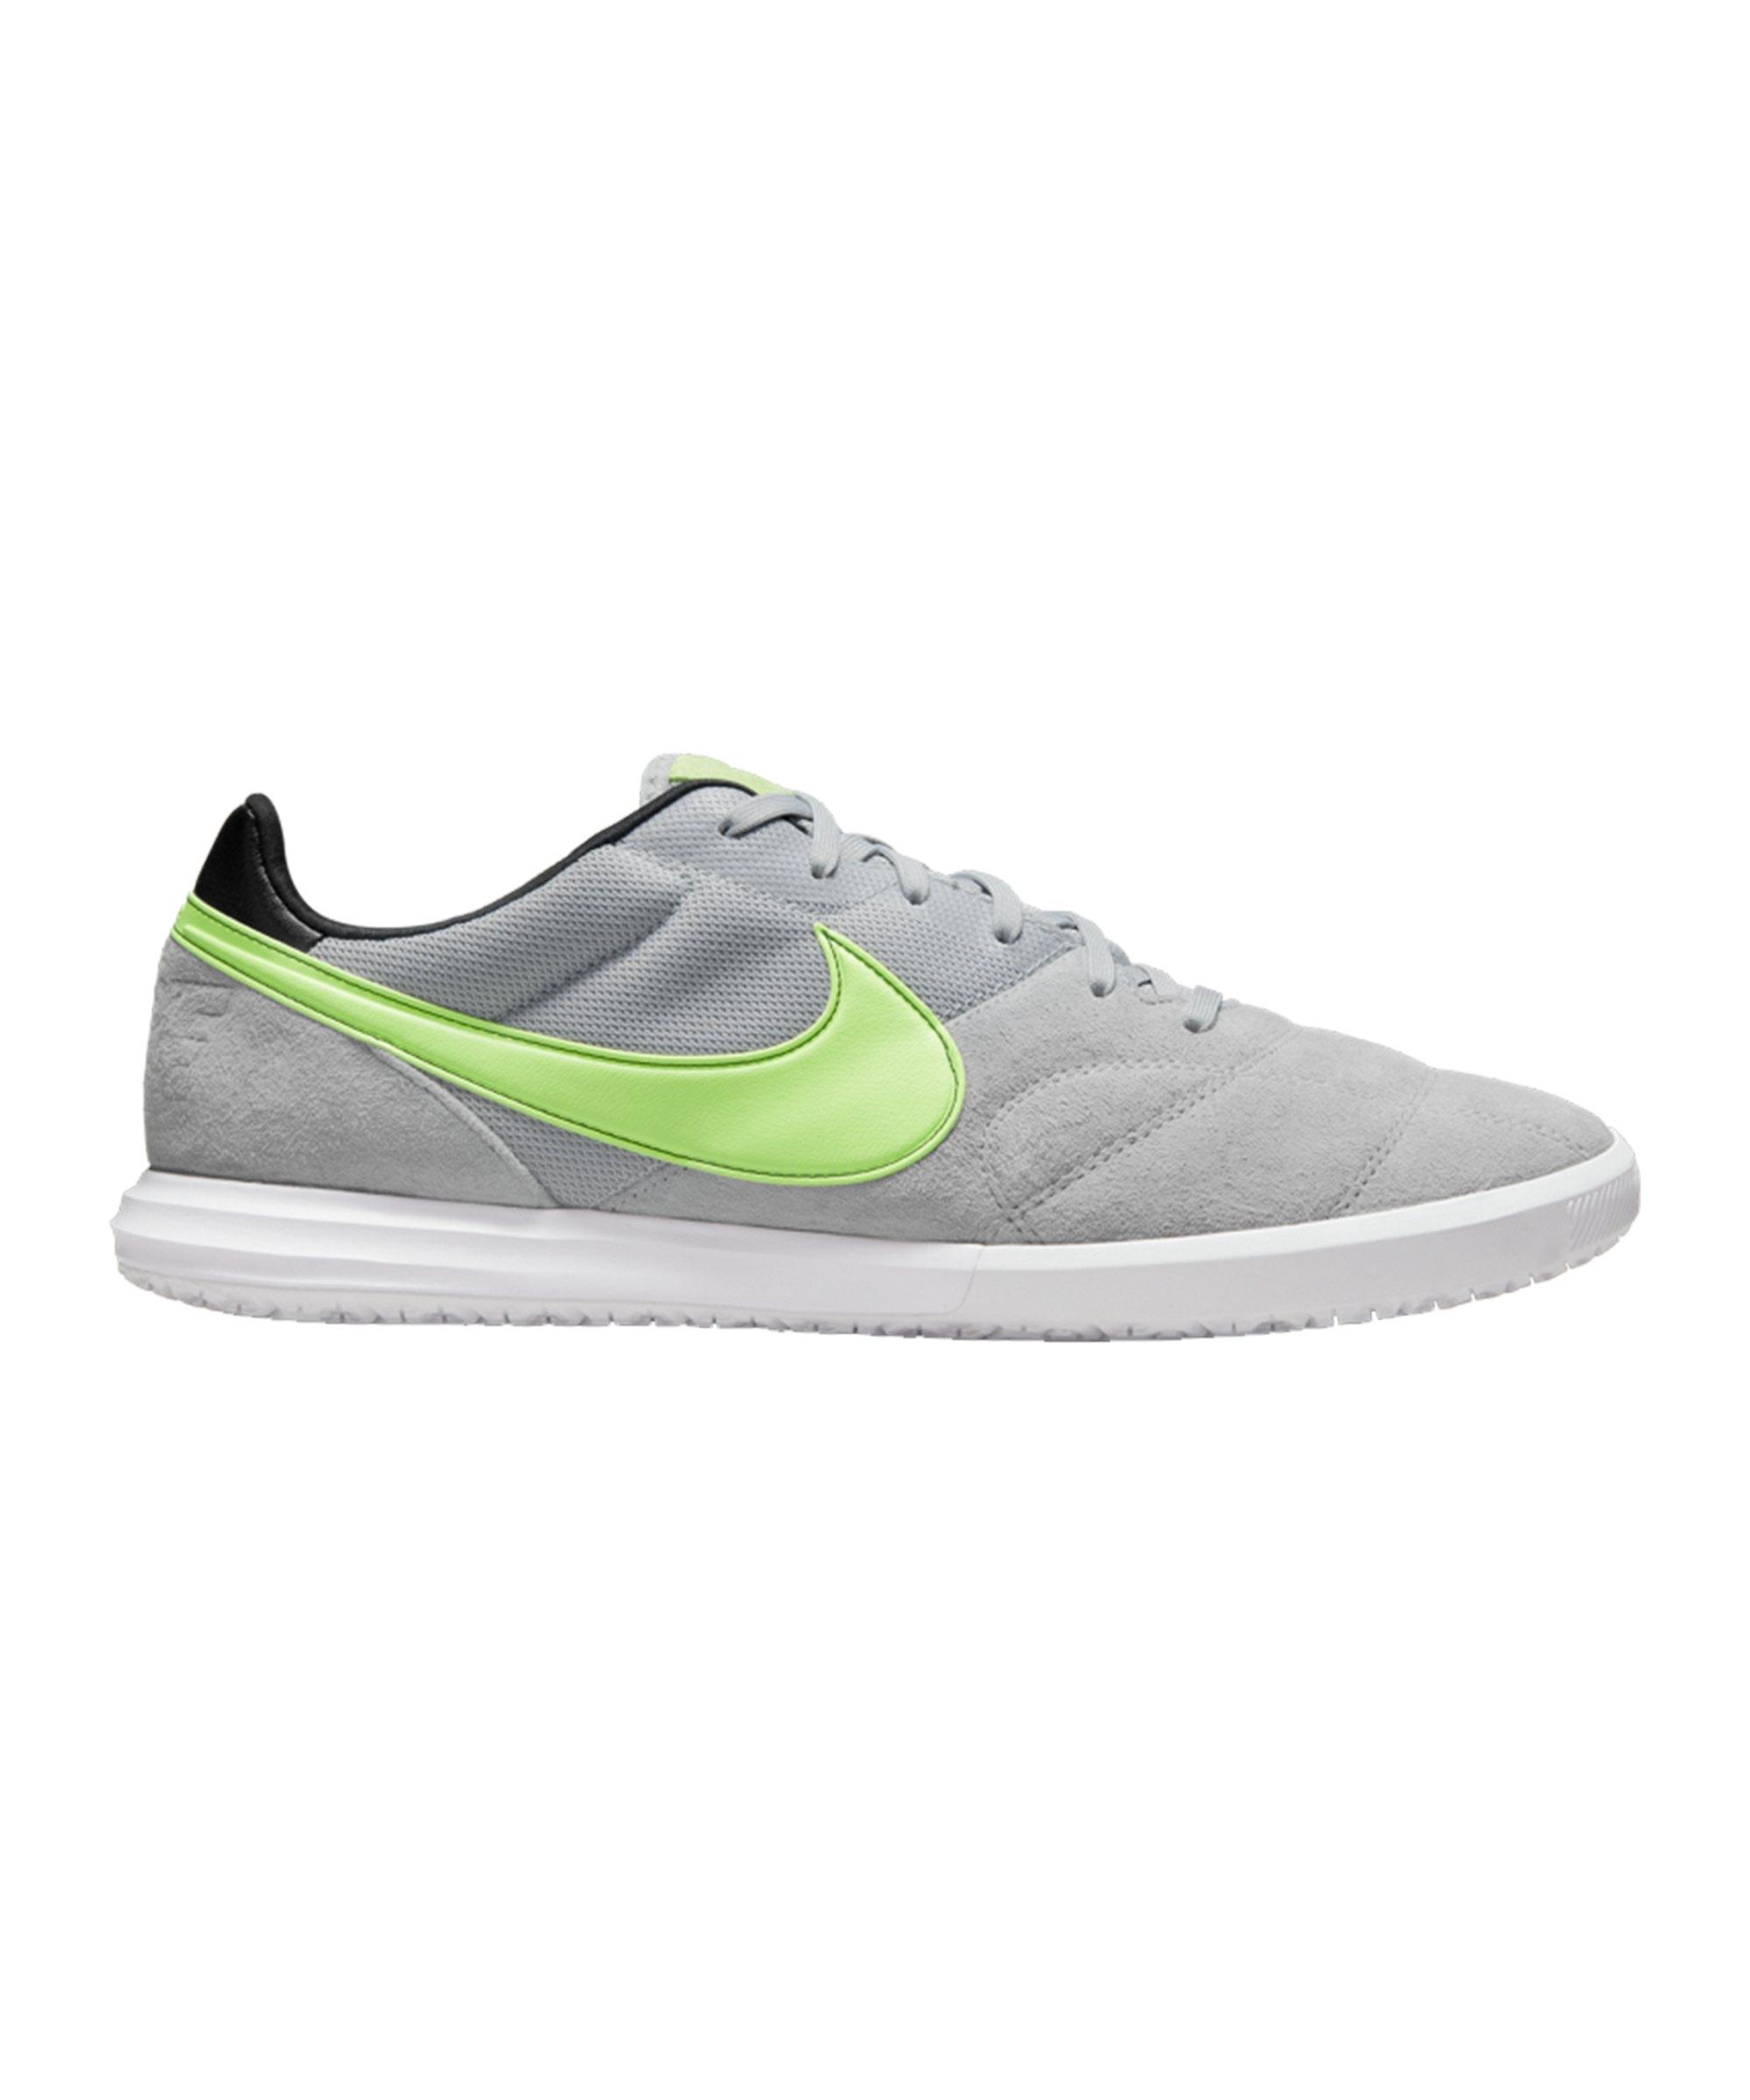 Nike Premier II Sala IC Grau Grün Weiss F012 - grau